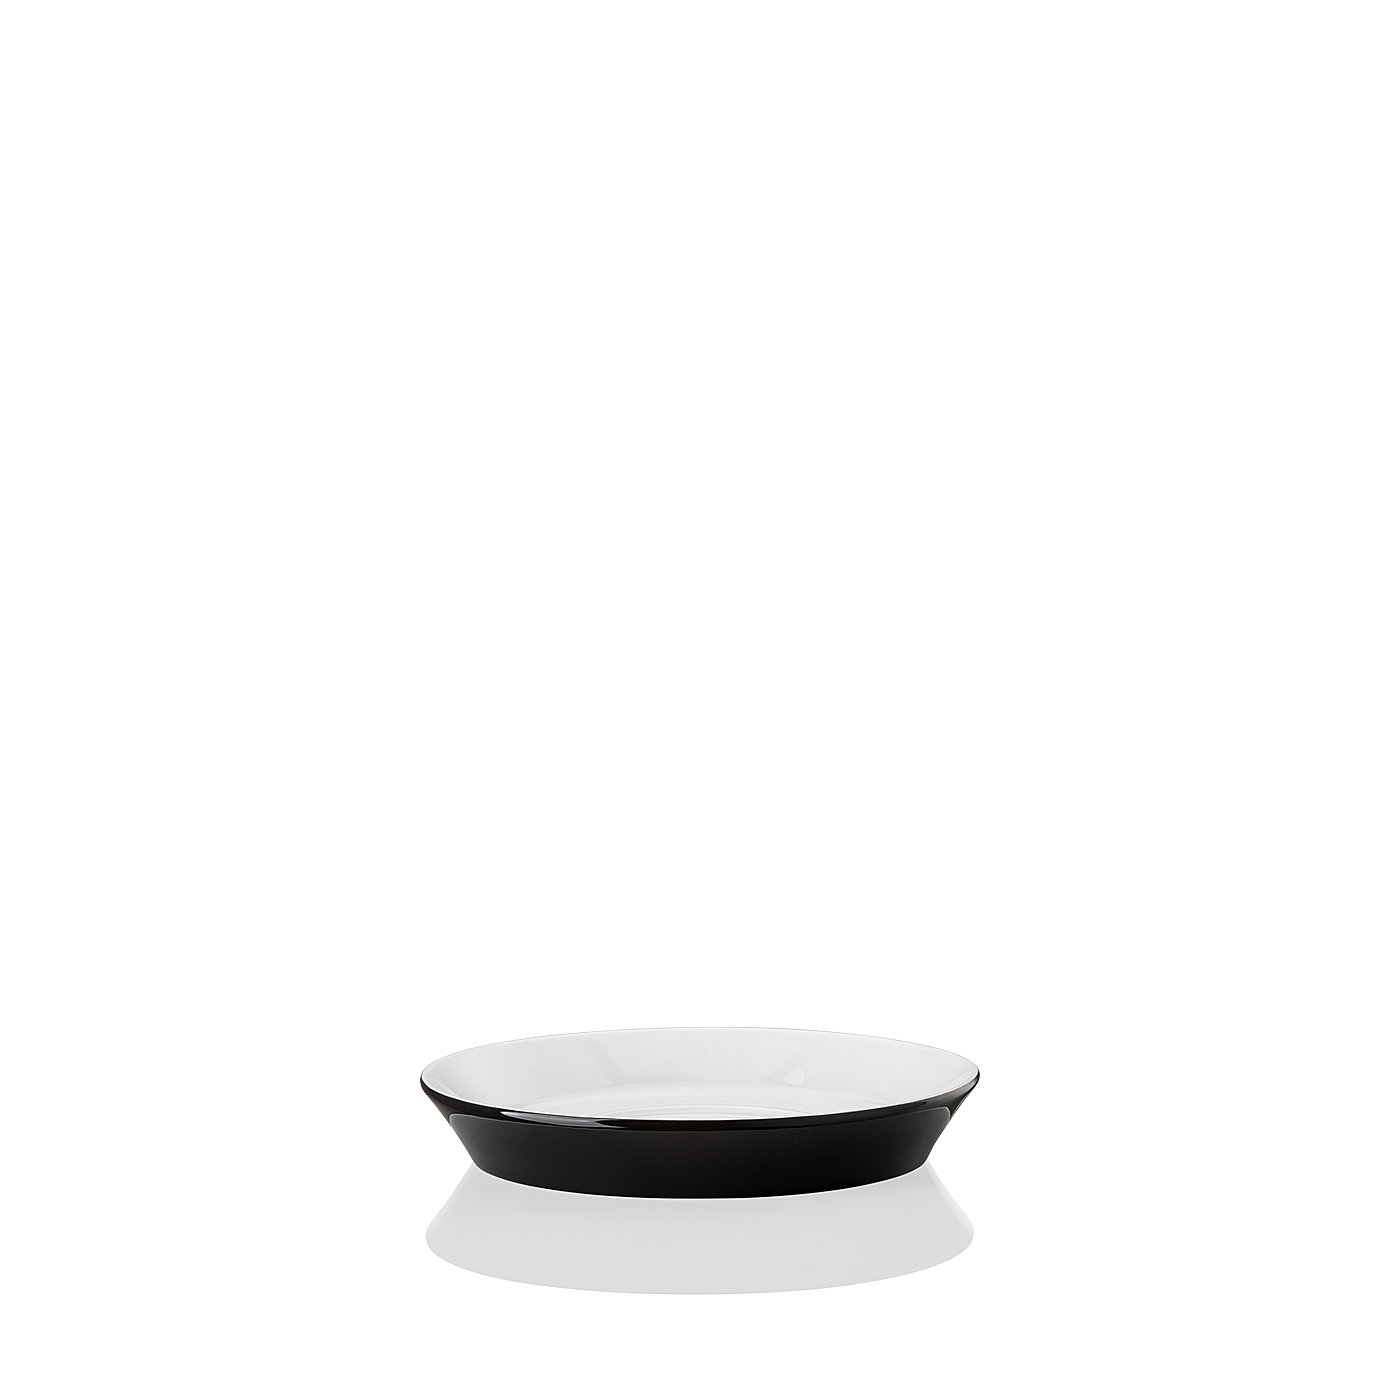 Kaffee-Untertasse Tric Monochrome Arzberg